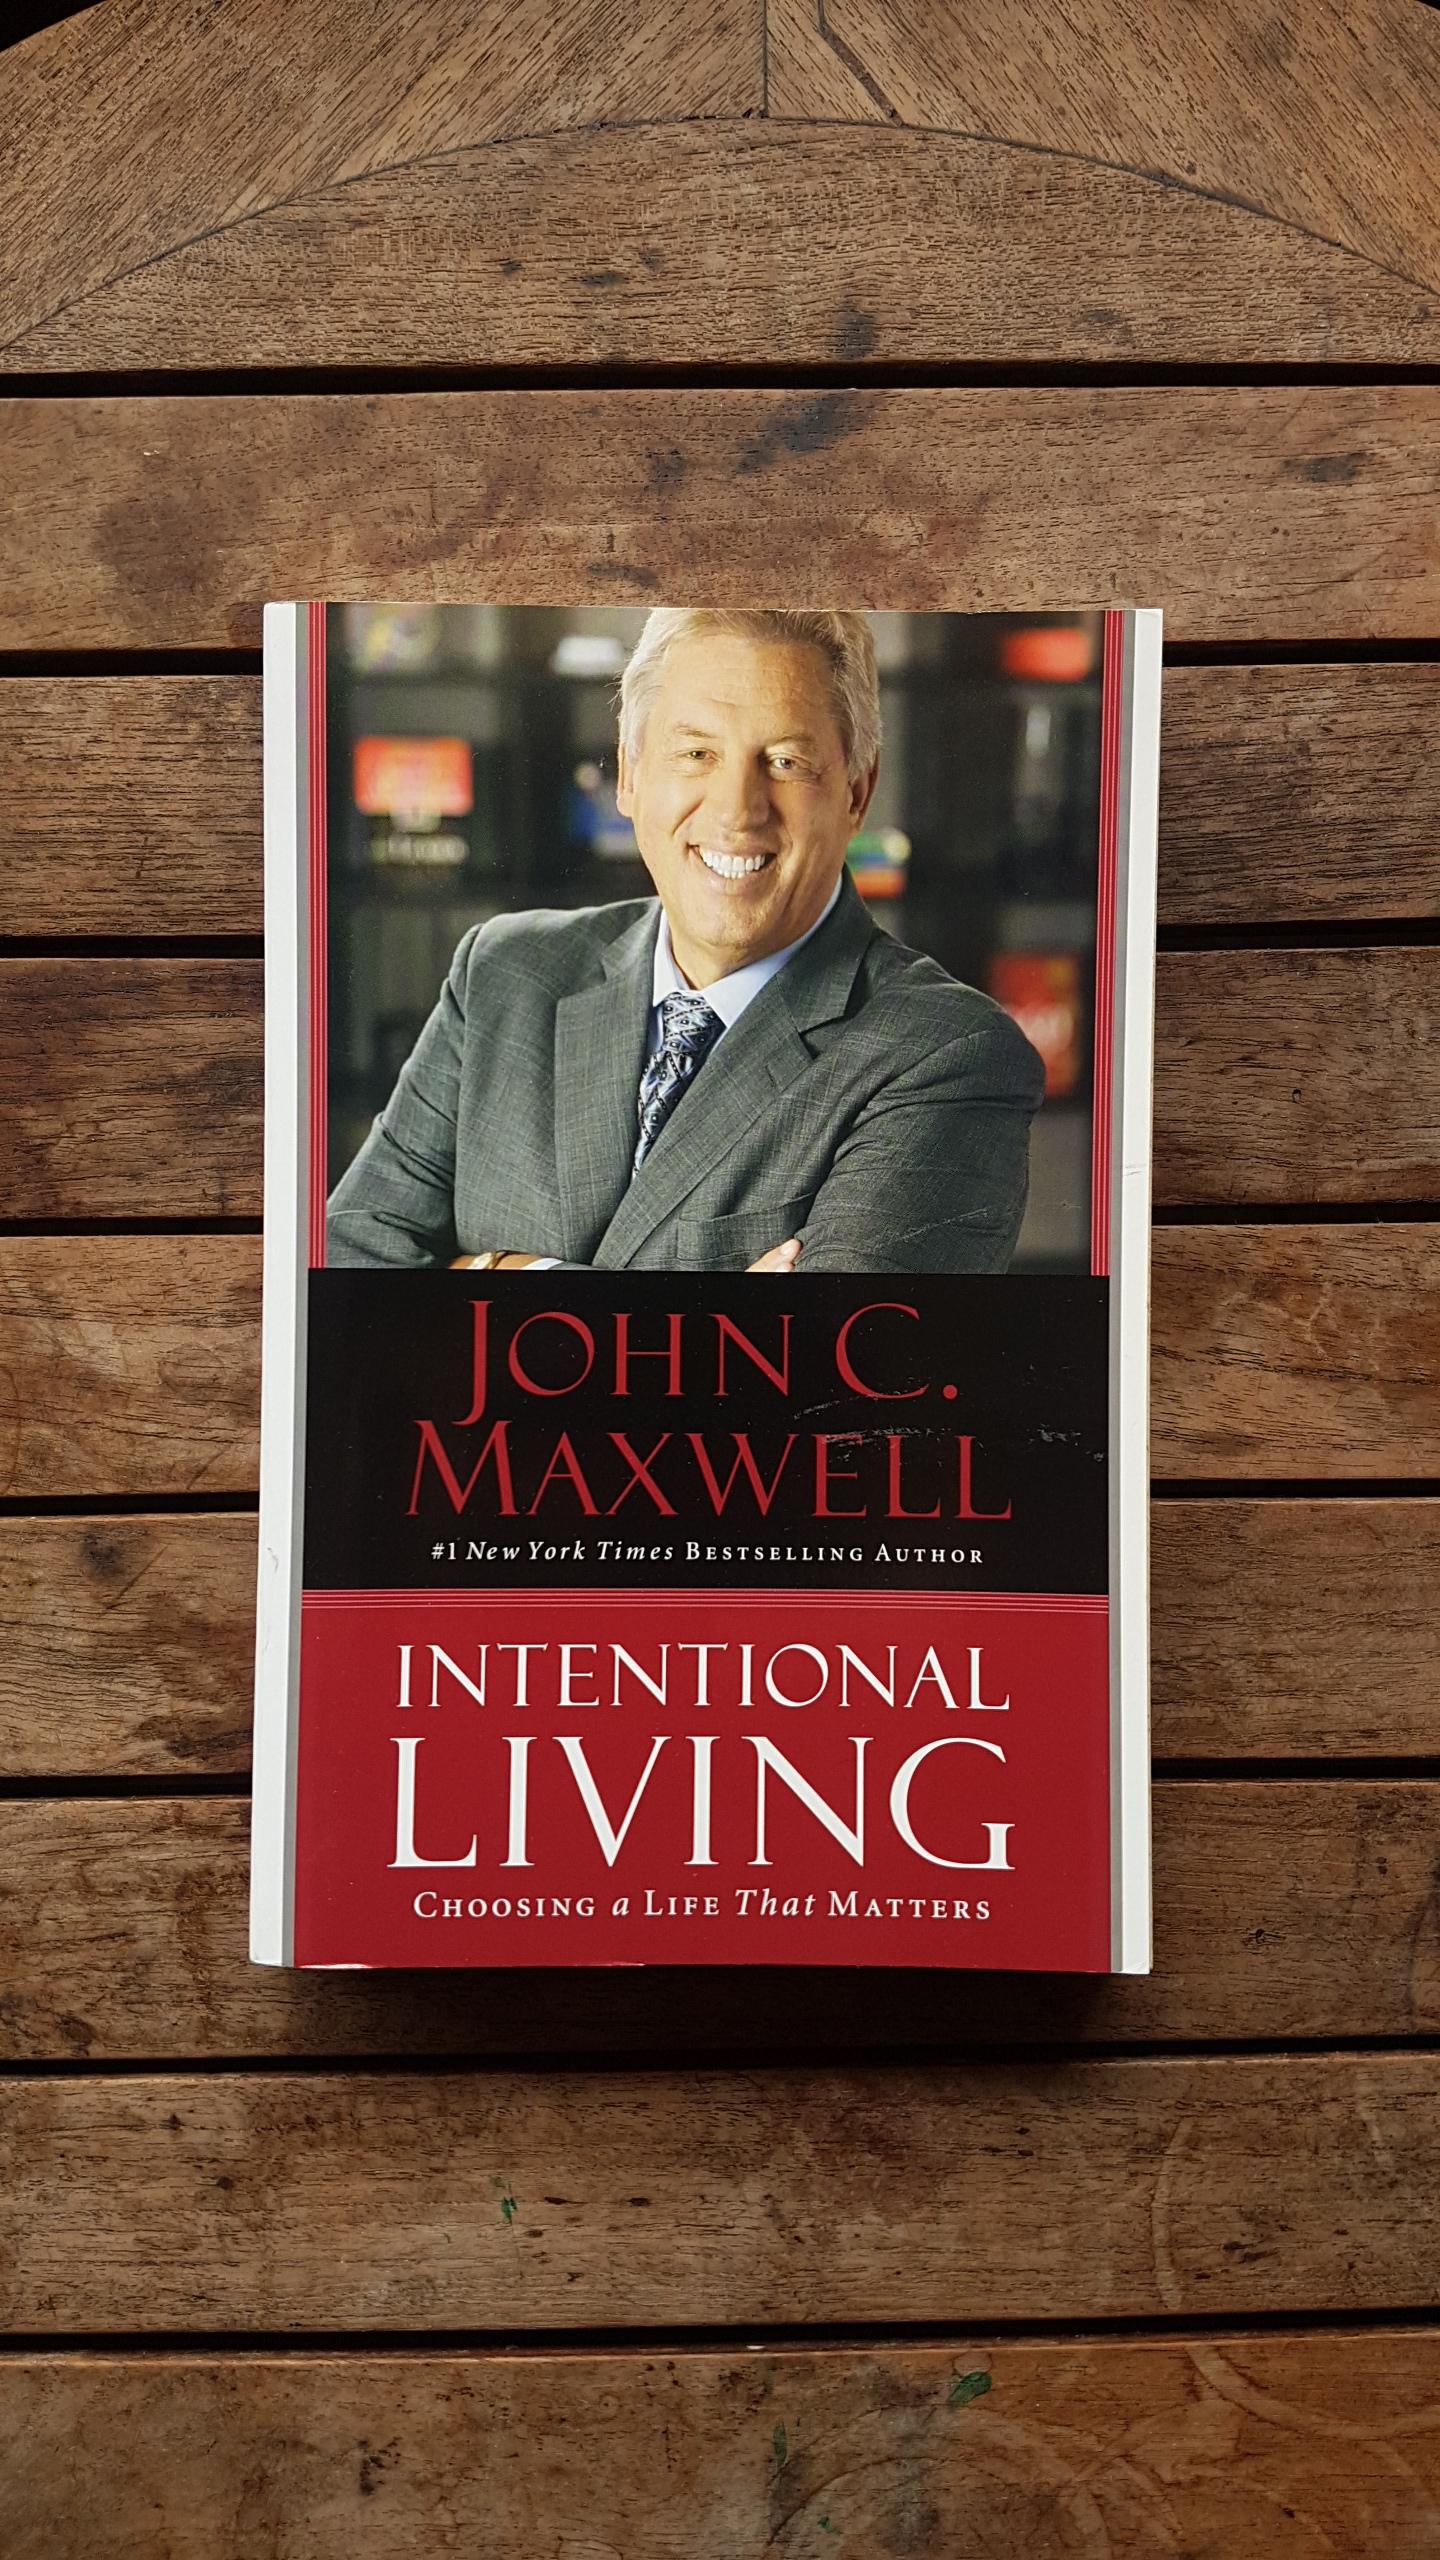 Intentional Living: Choosing a Life That Matters   by John C. Maxwell